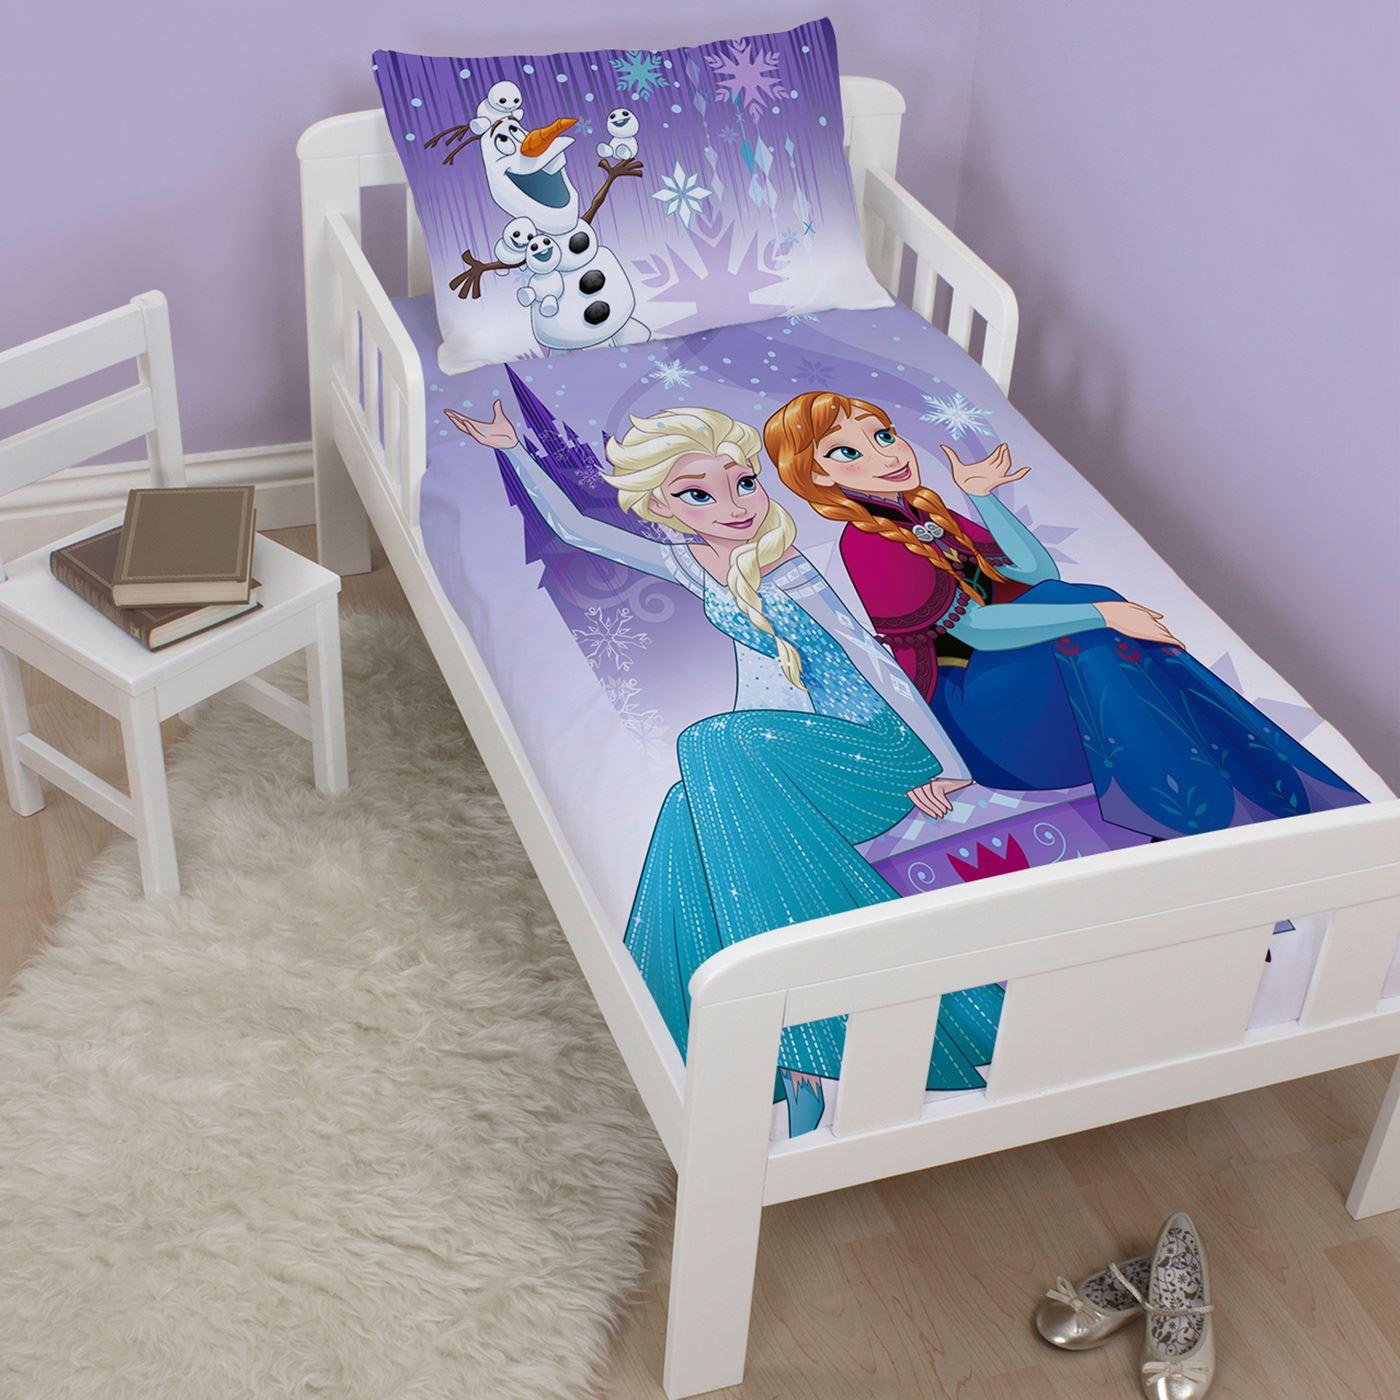 Winnie the pooh toddler bedding - Junior Duvet Cover Sets Toddler Bedding Paw Patrol